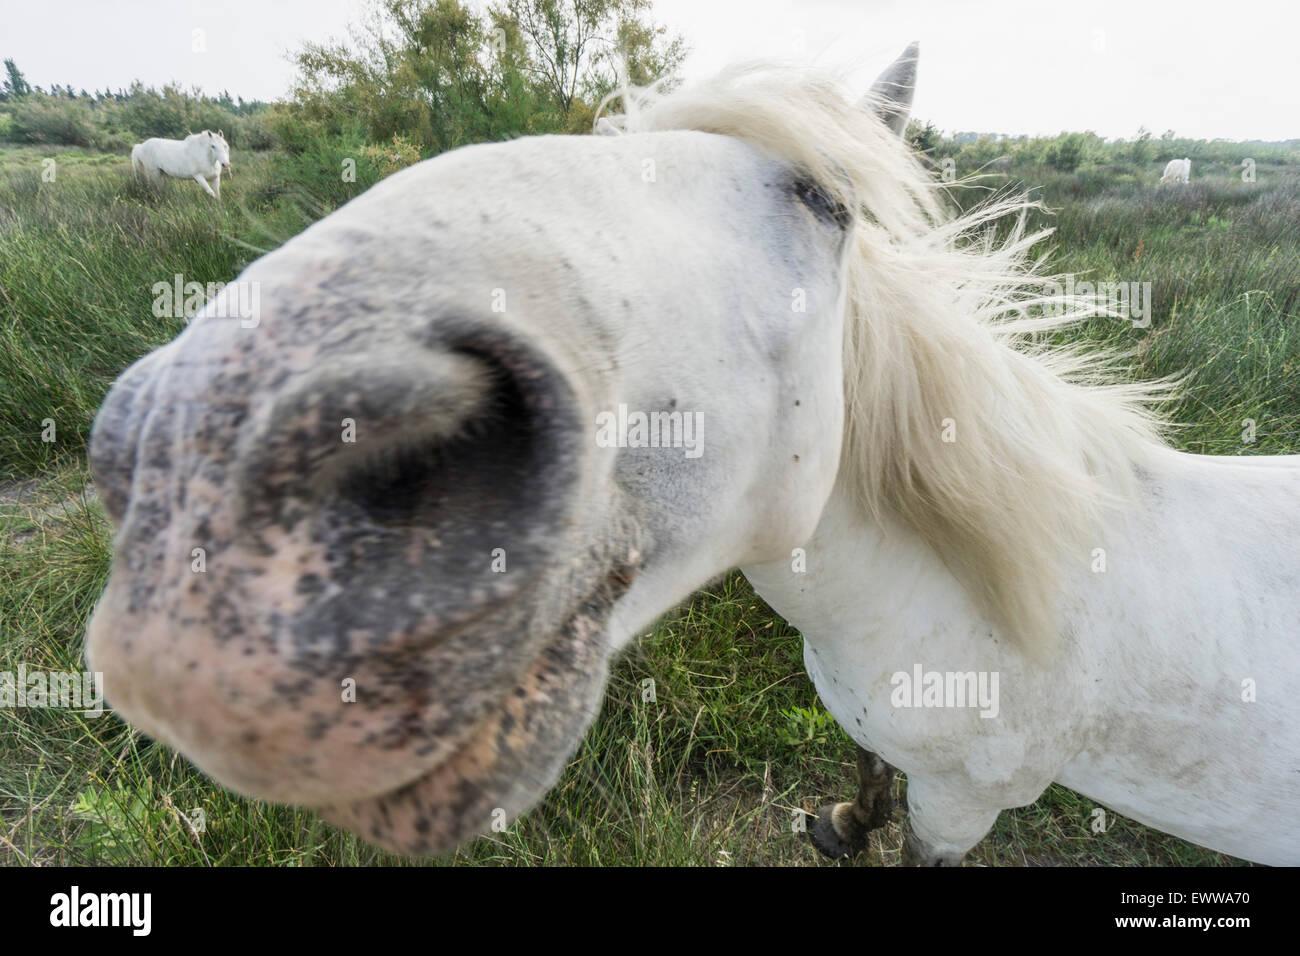 Camargue Horses (Equus caballus), Saintes-Marie-de-la-Mer, Camargue, France, Europe - Stock Image